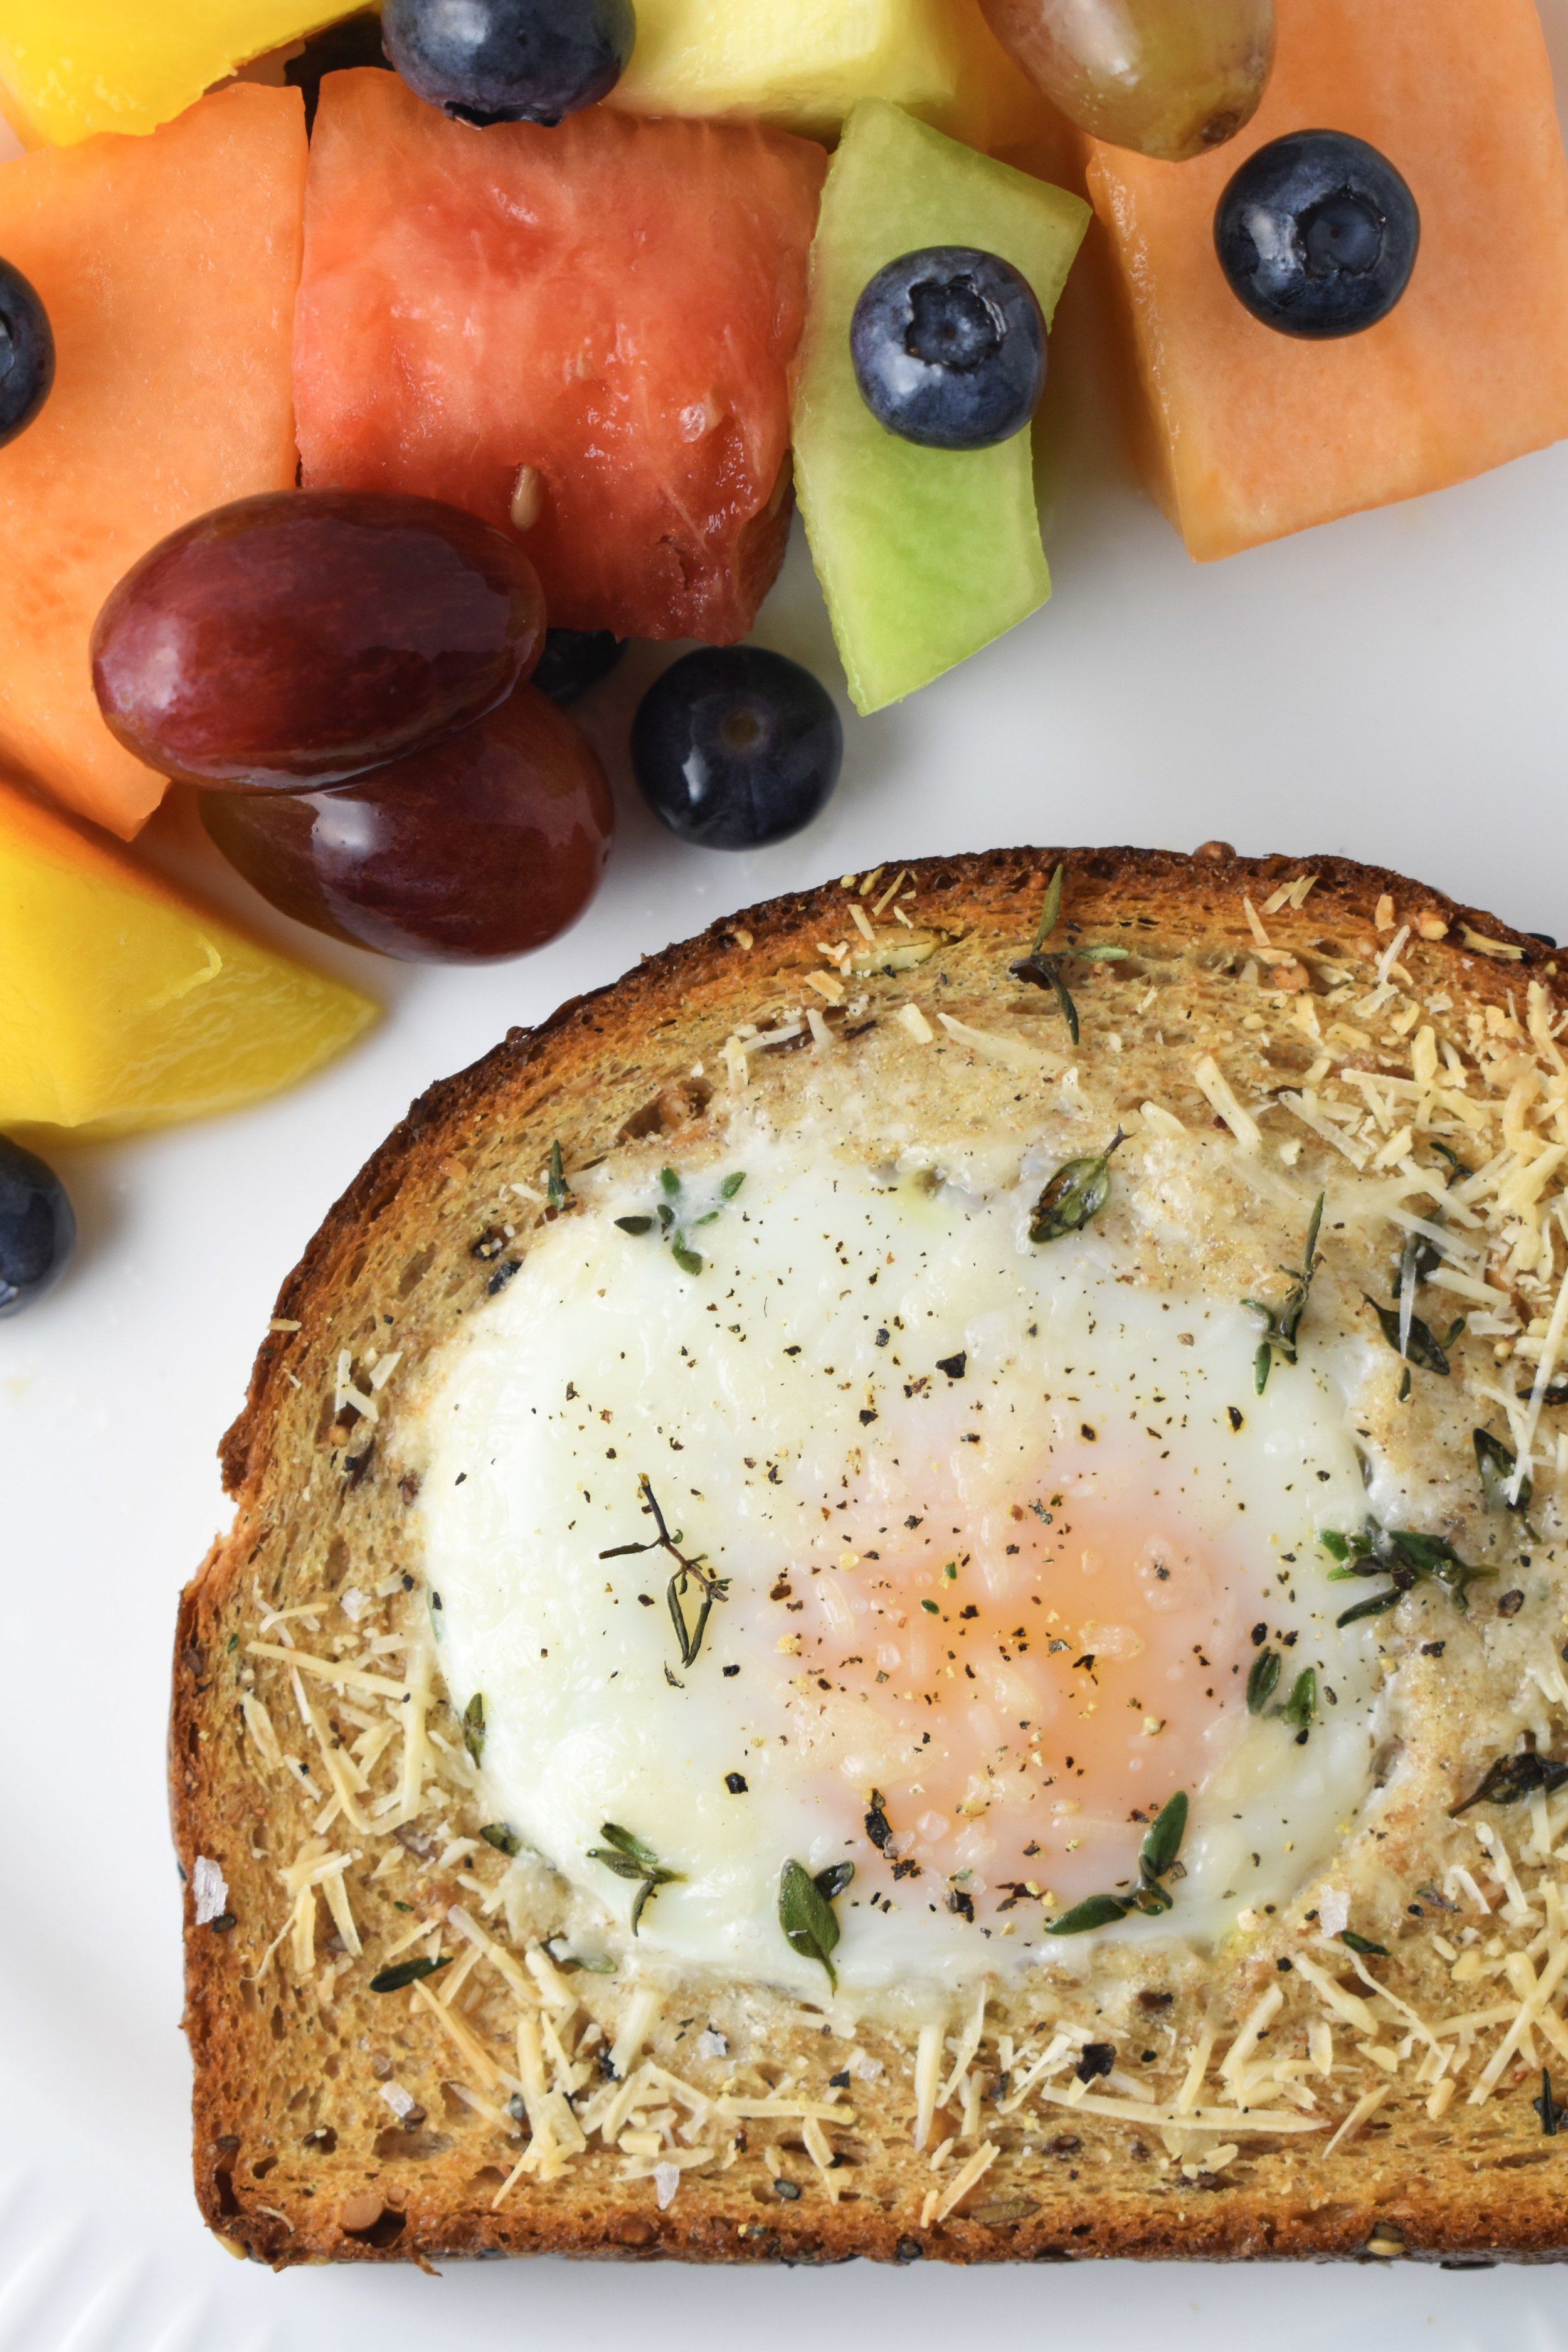 10-Minute Dinner: Sheet Pan Egg-In-A-Hole / CarolynWilliamsRD.com